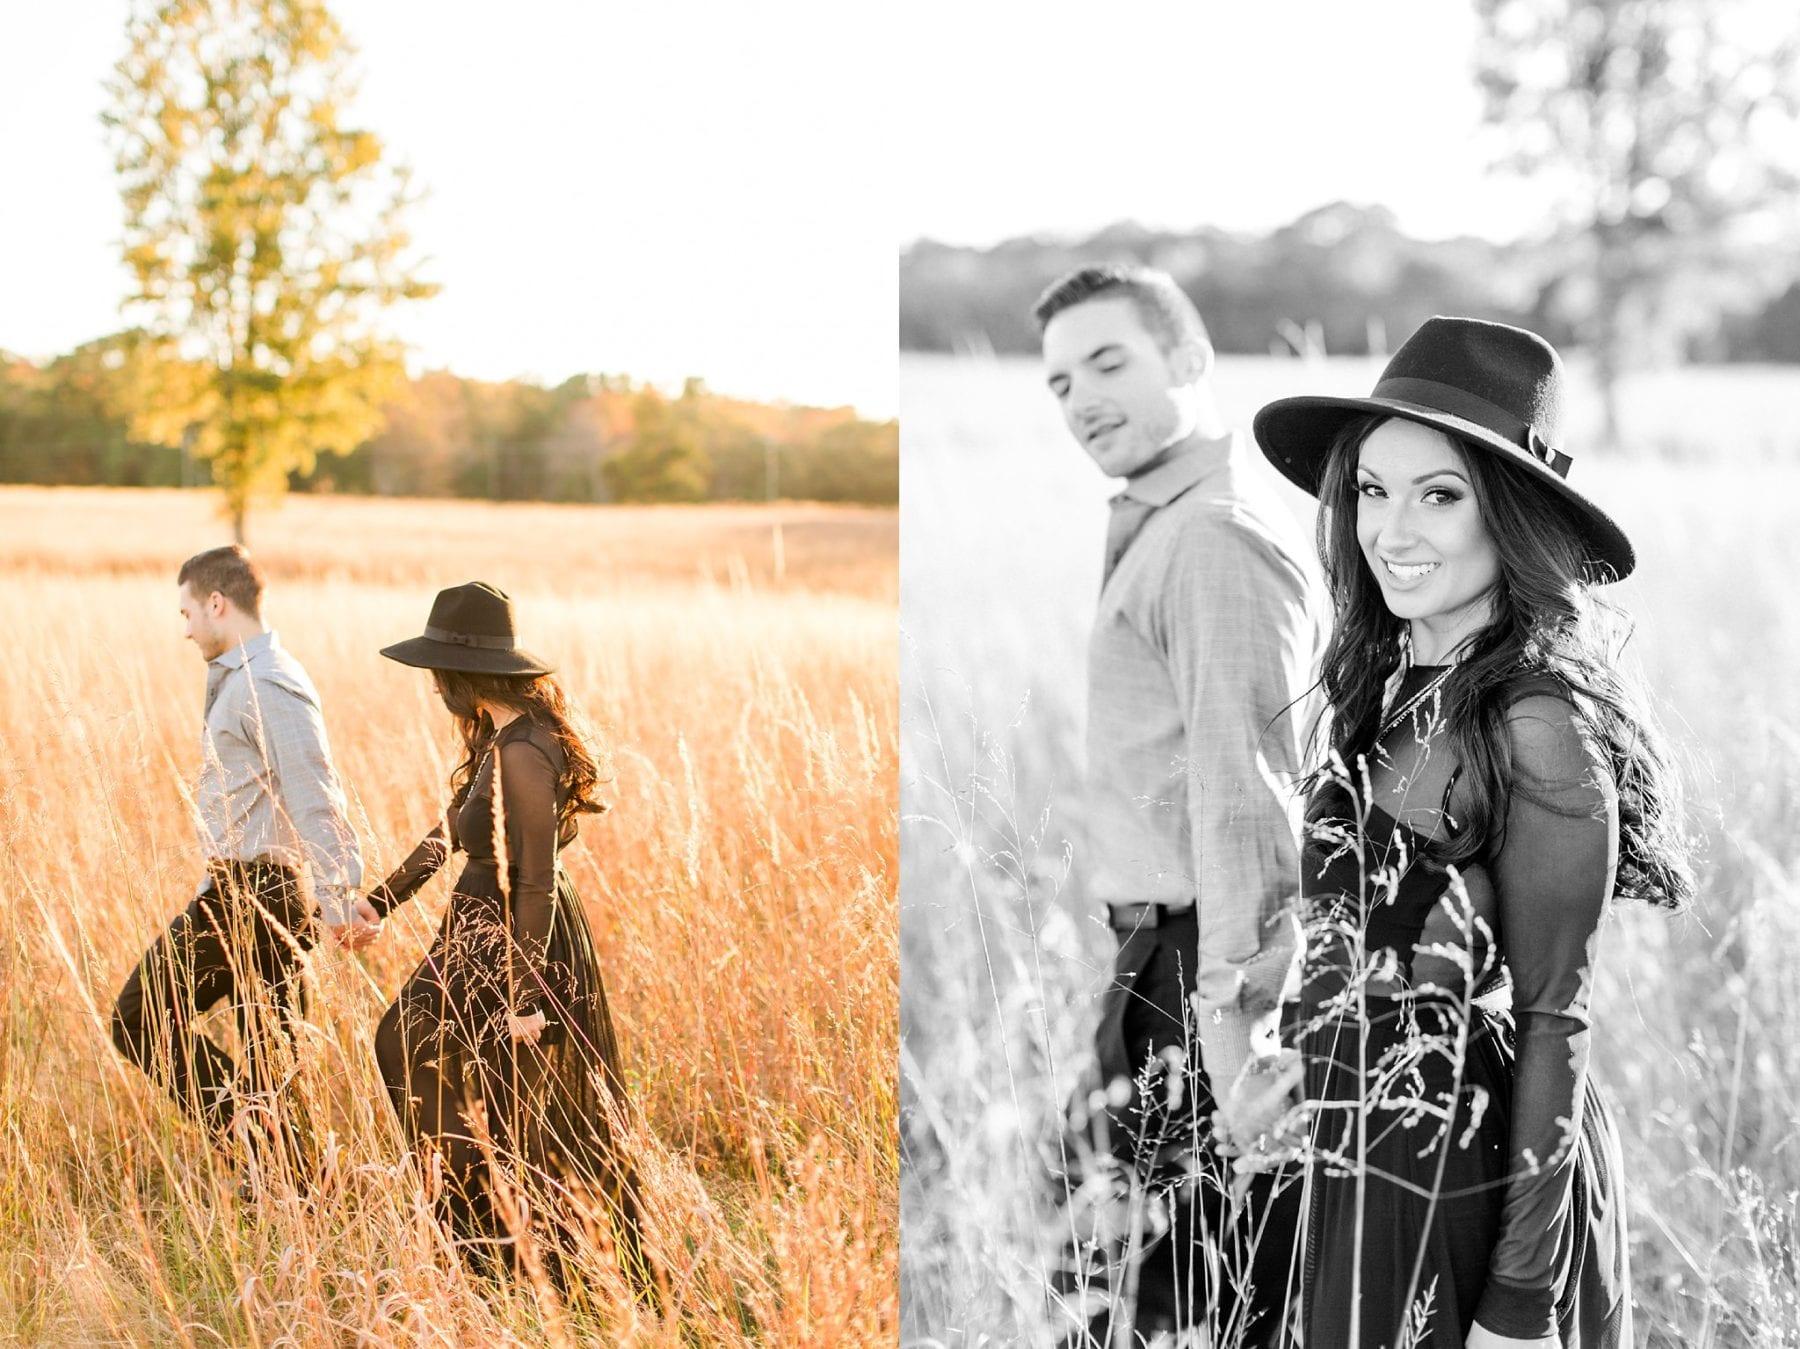 Manassas Battlefield Portraits Virginia Wedding Photographer Megan Kelsey Photography Lianne & Chris-195.jpg